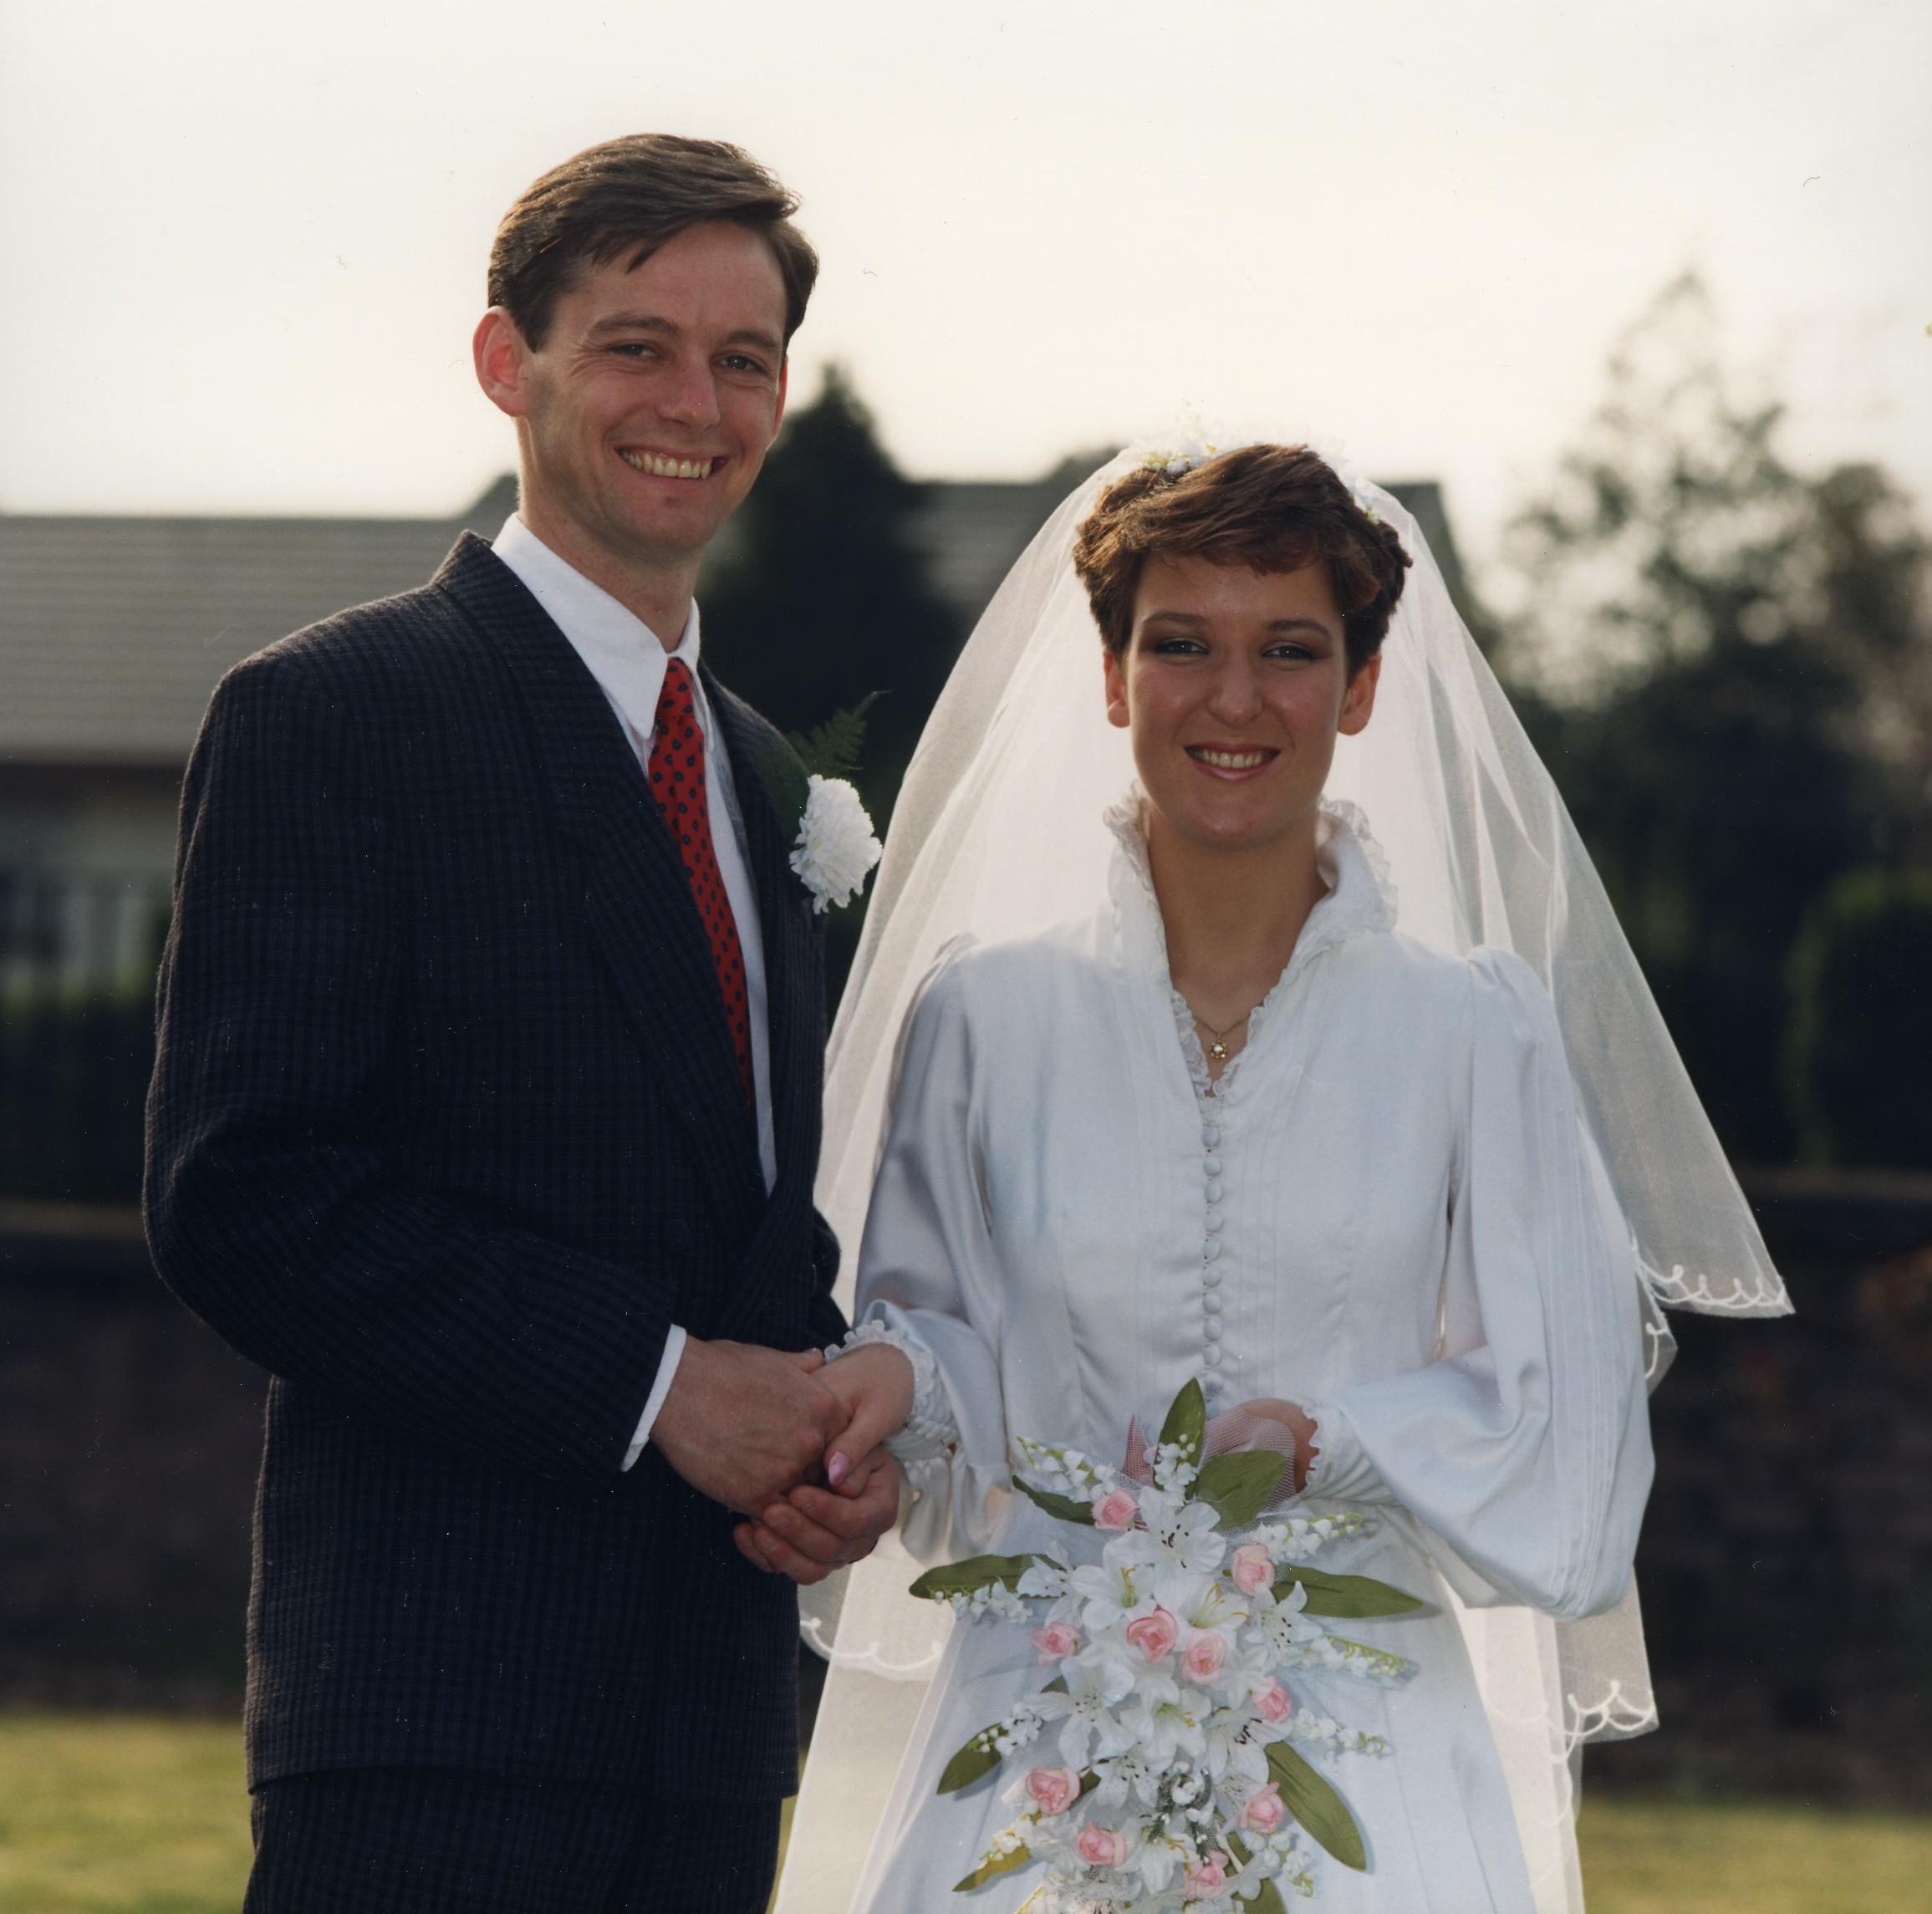 Craig McIntyre & Celene Dorman's Wedding